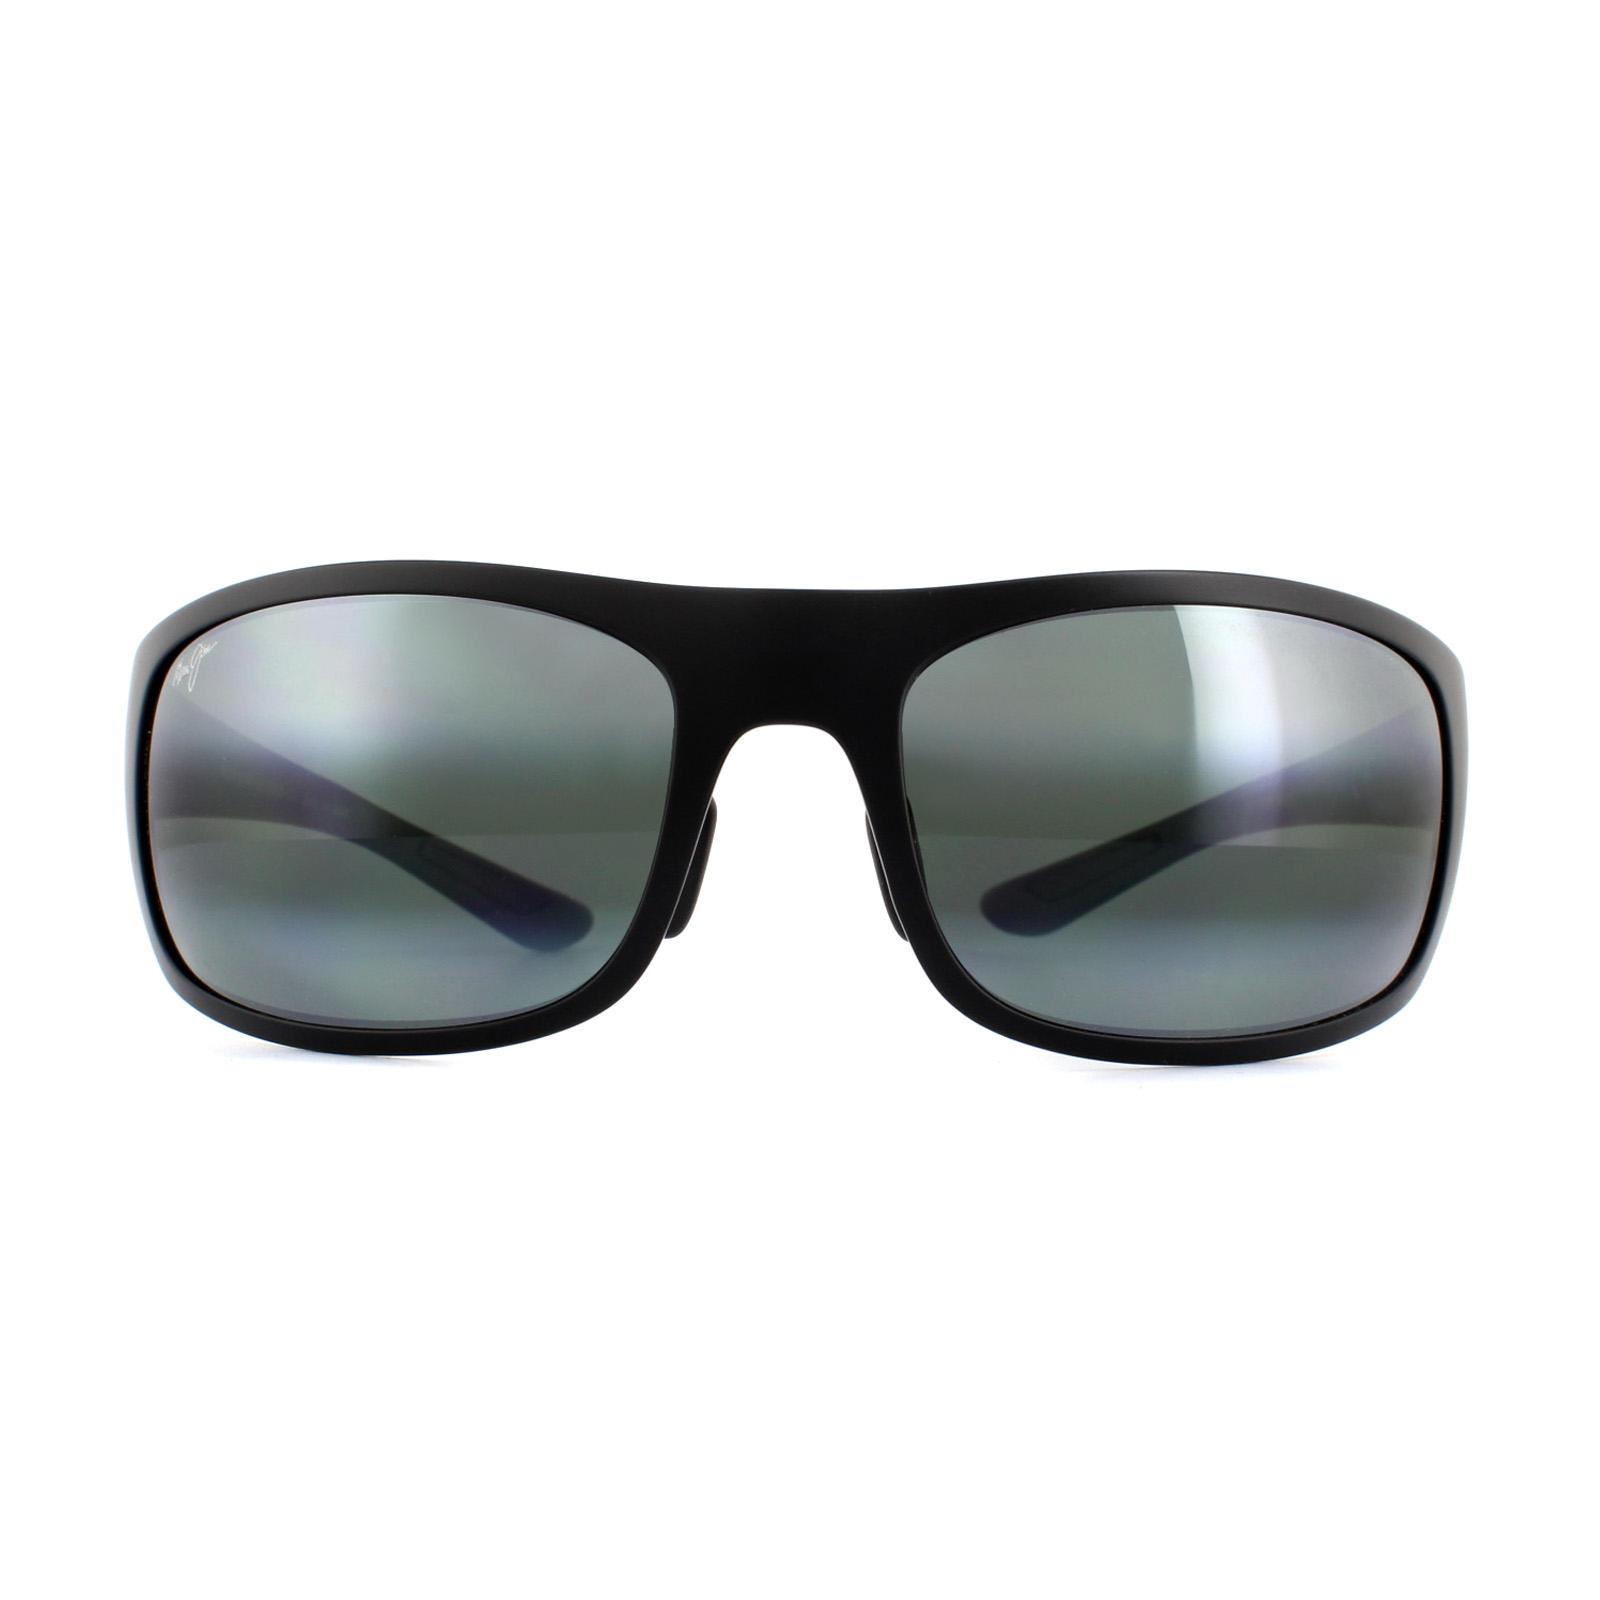 fe9d8c5233 Cheap Maui Jim Big Wave Sunglasses - Discounted Sunglasses